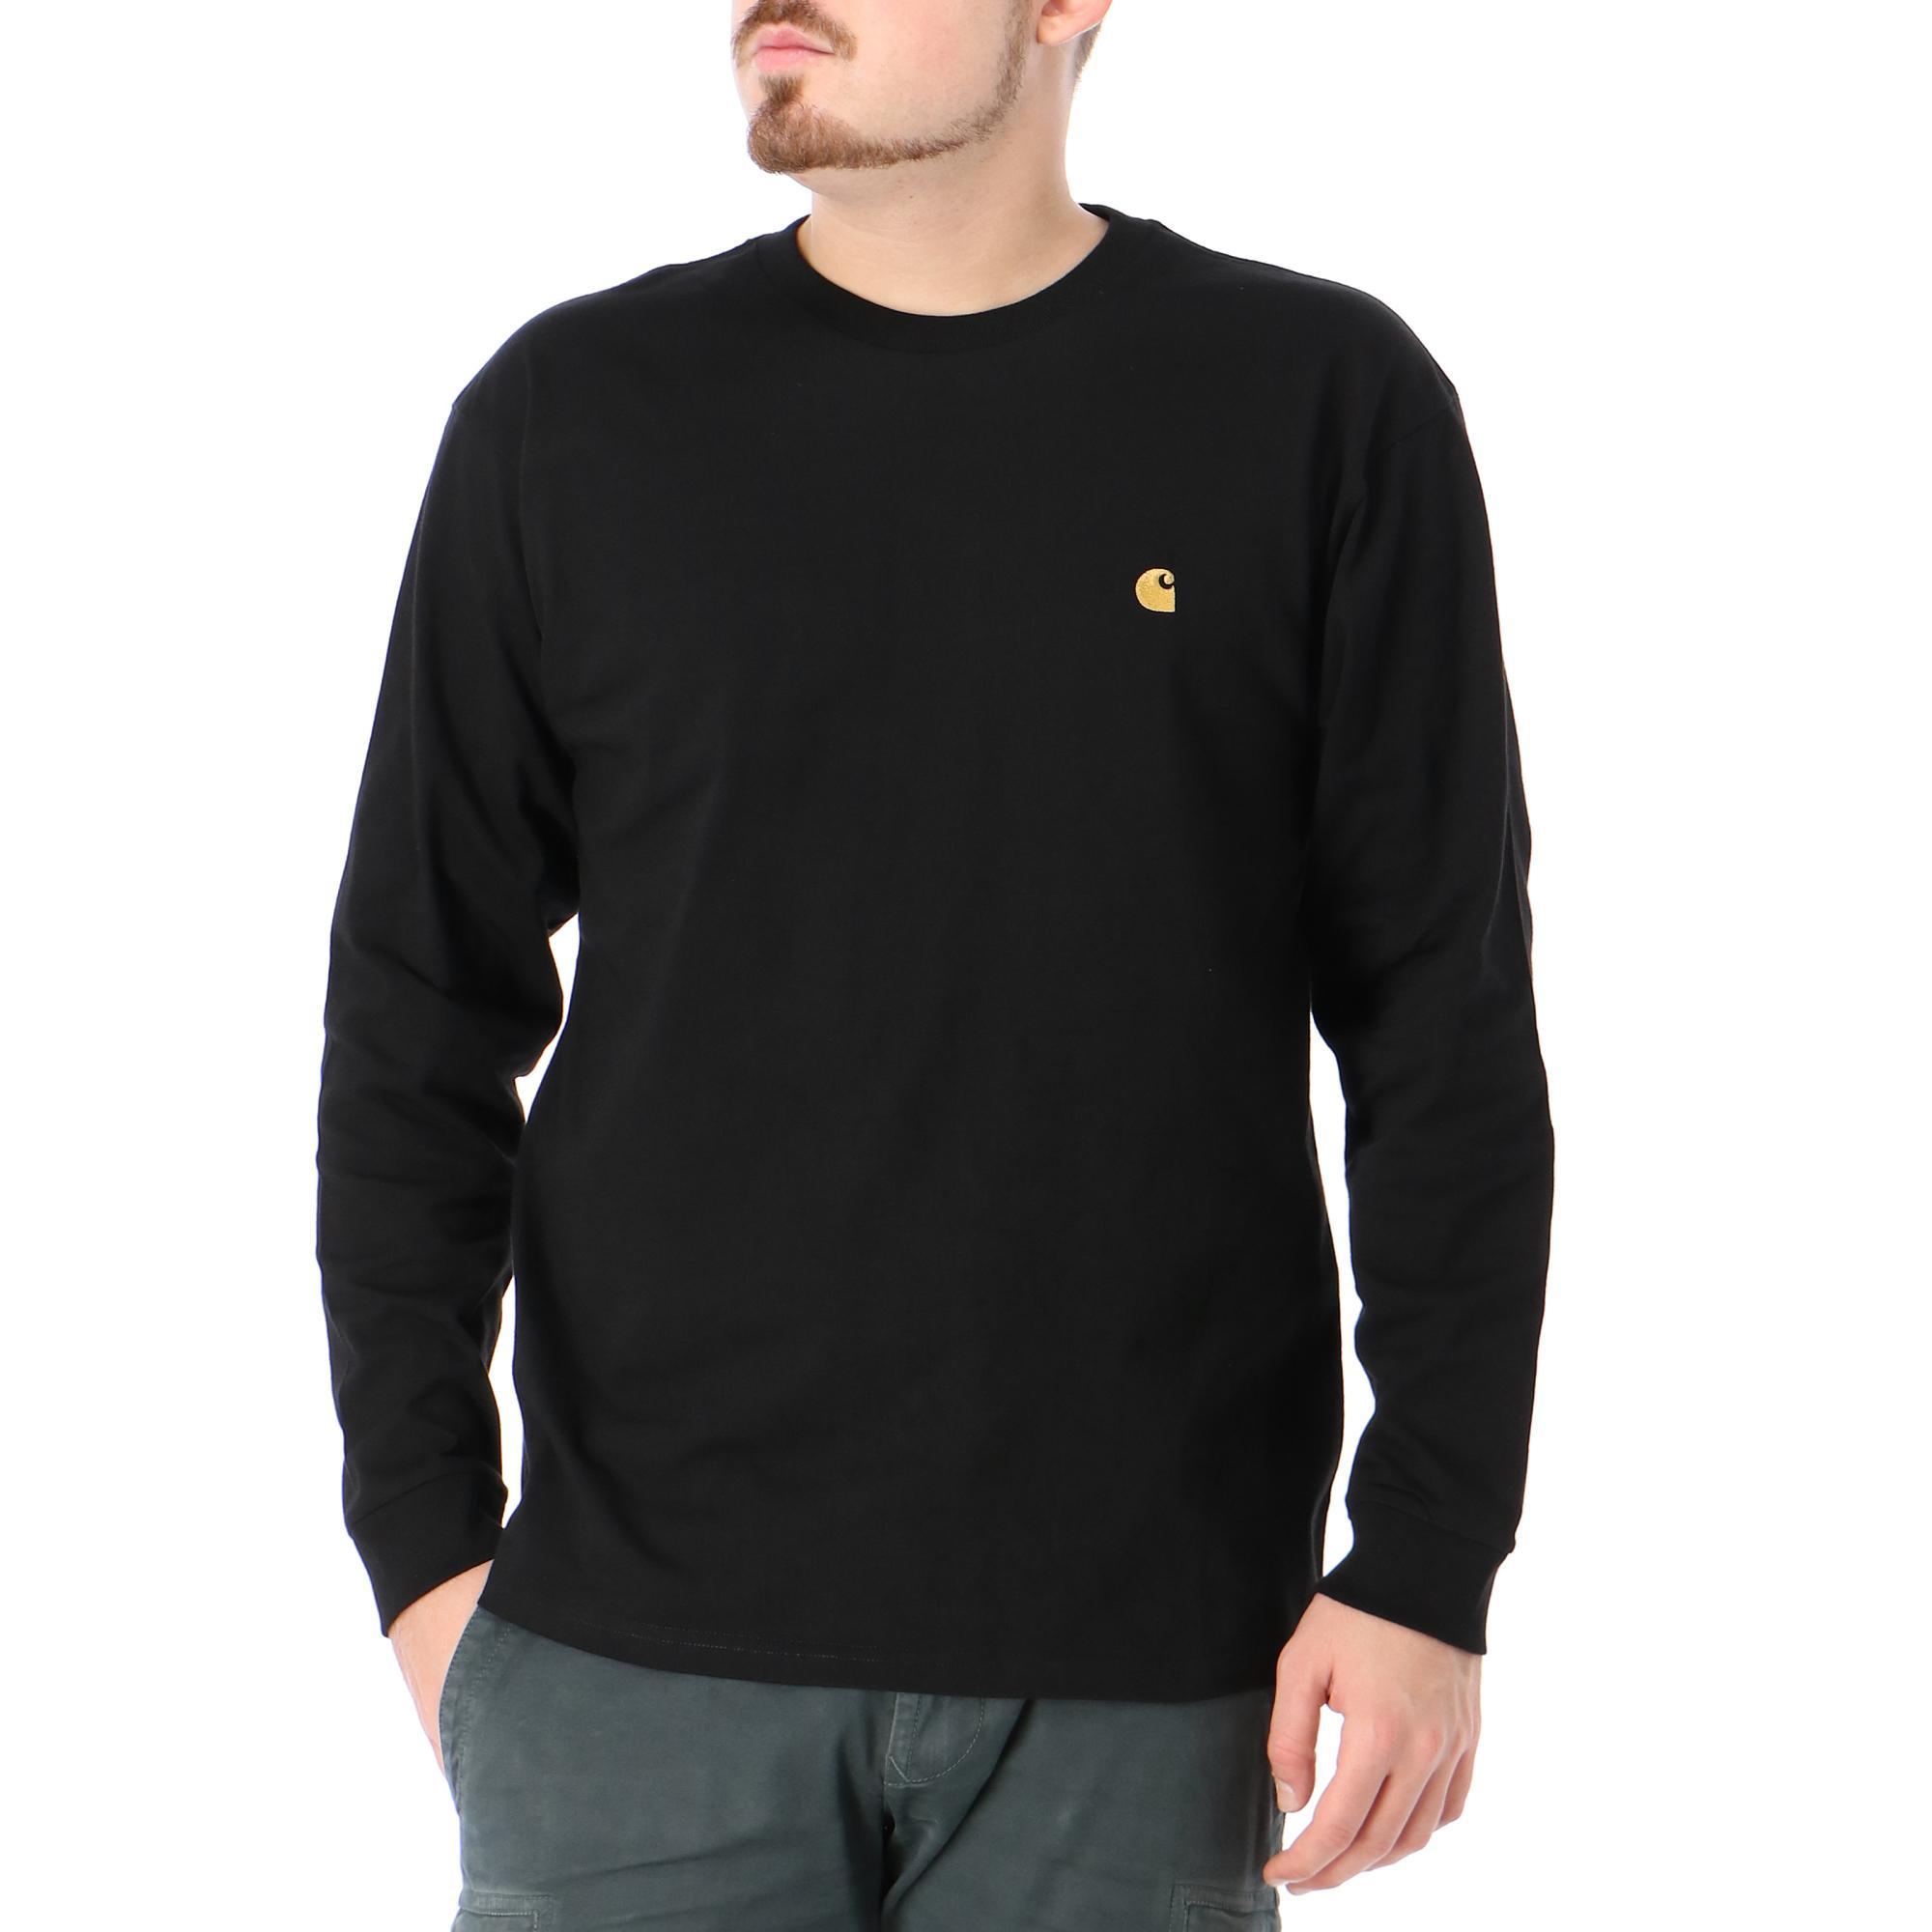 Carhartt L/s Chase T-shirt Black gold